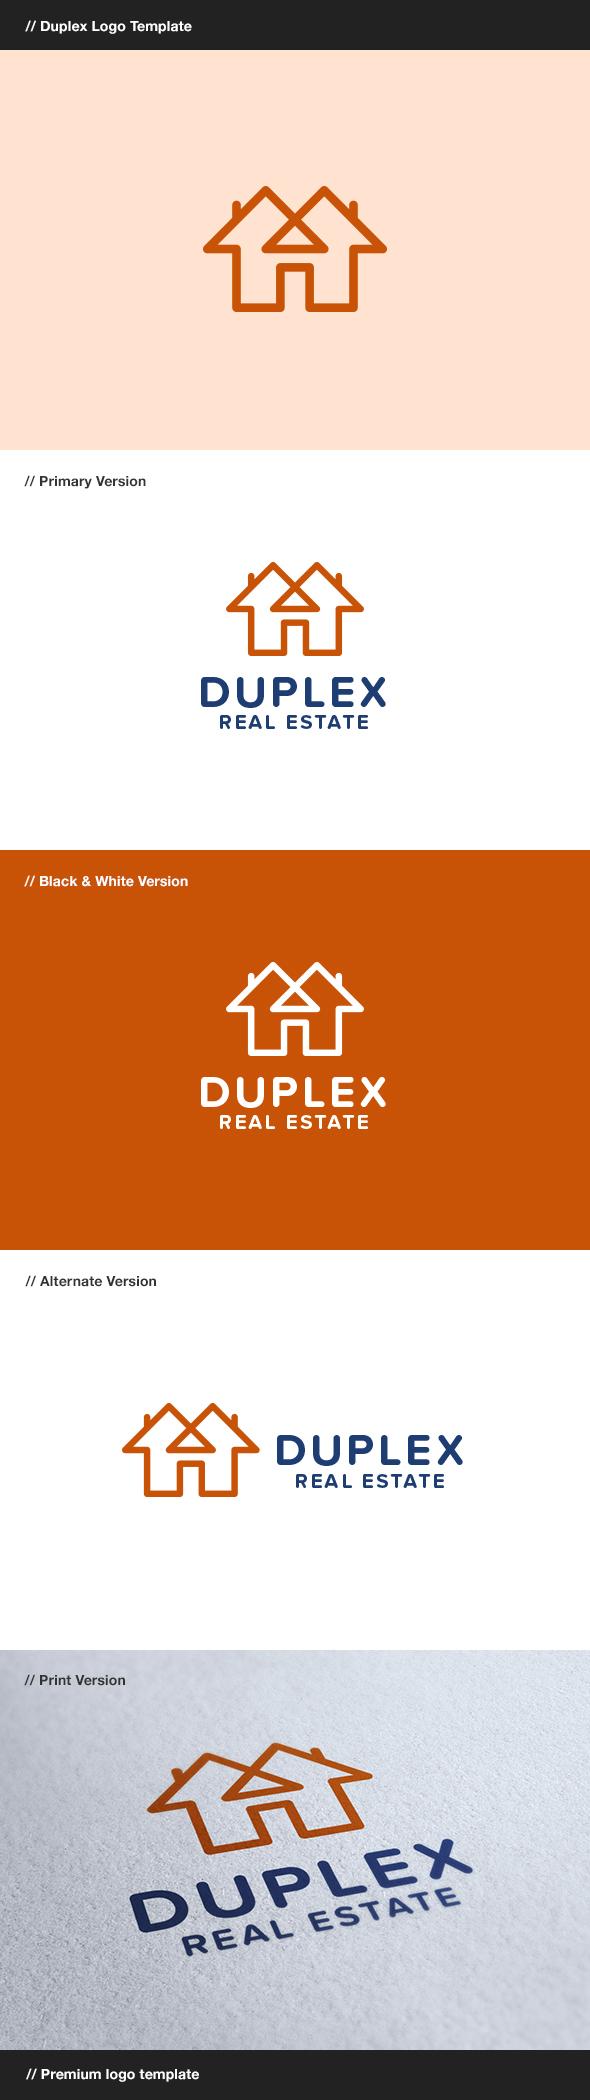 Duplex - Construction & Real Estate Logo